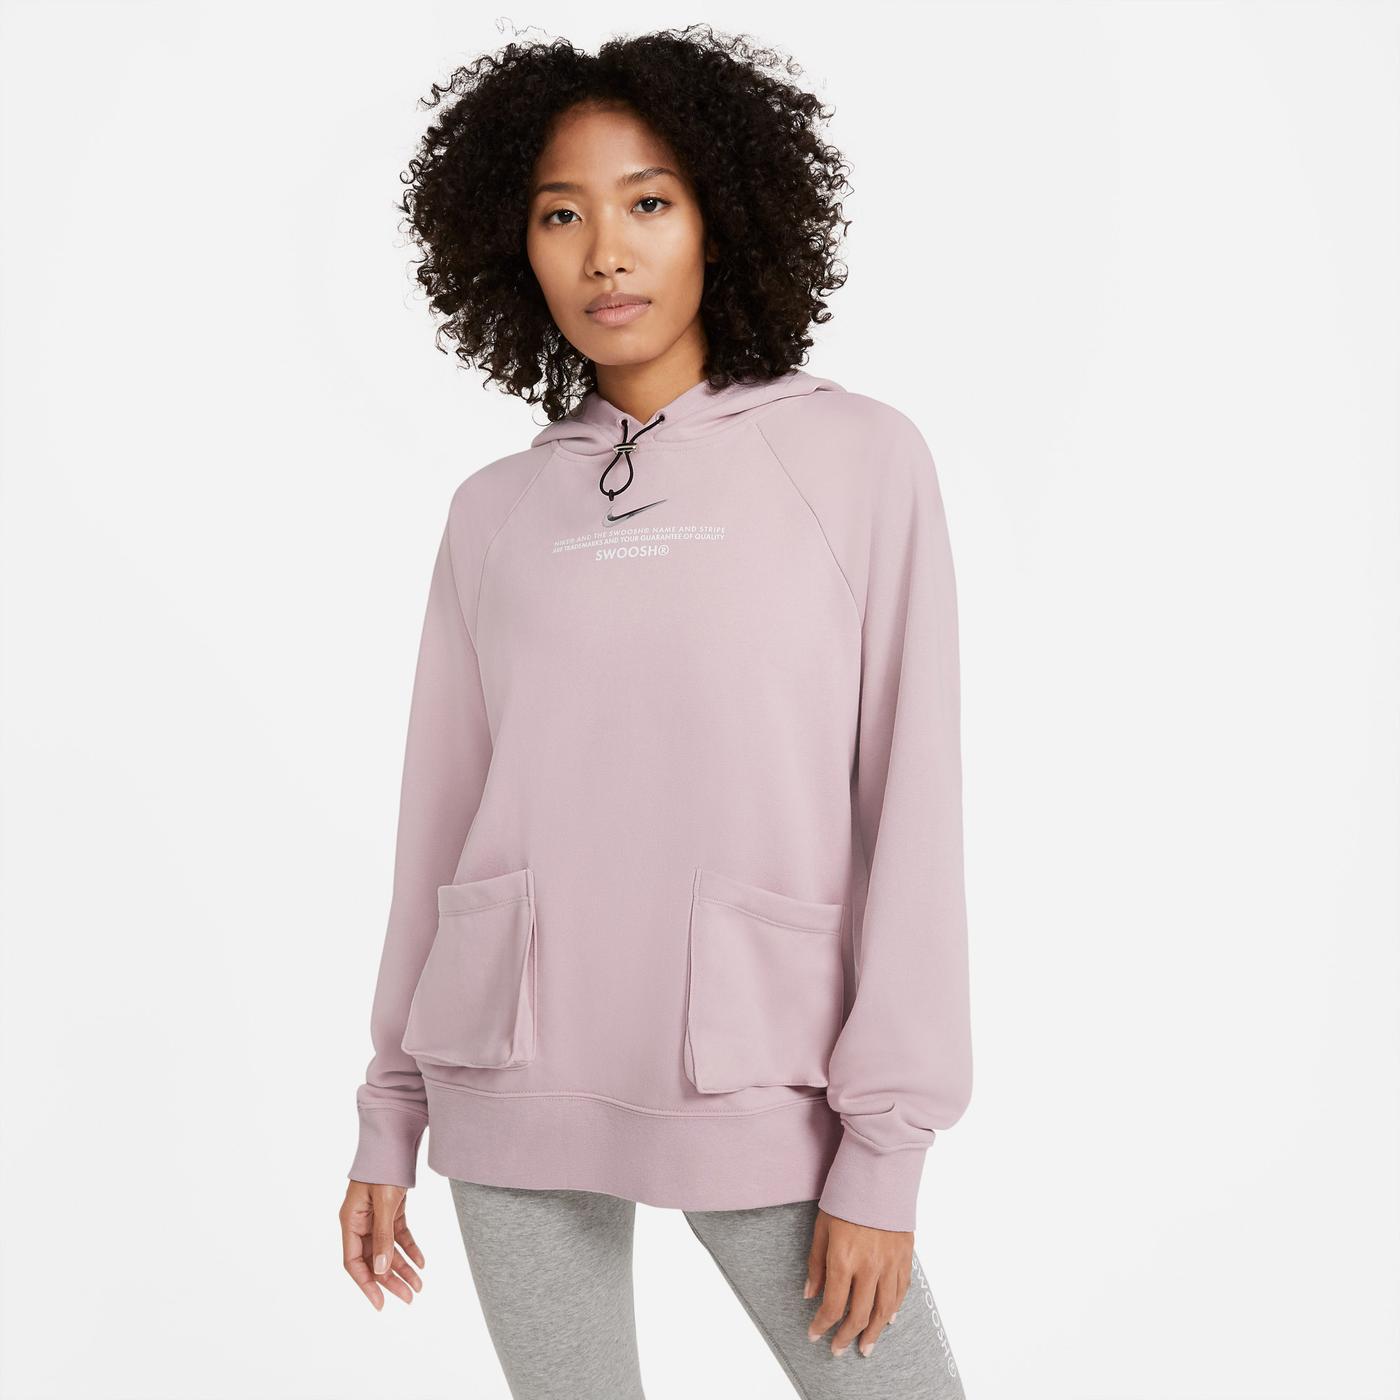 Nike Swoosh Kadın Pembe Sweatshirt